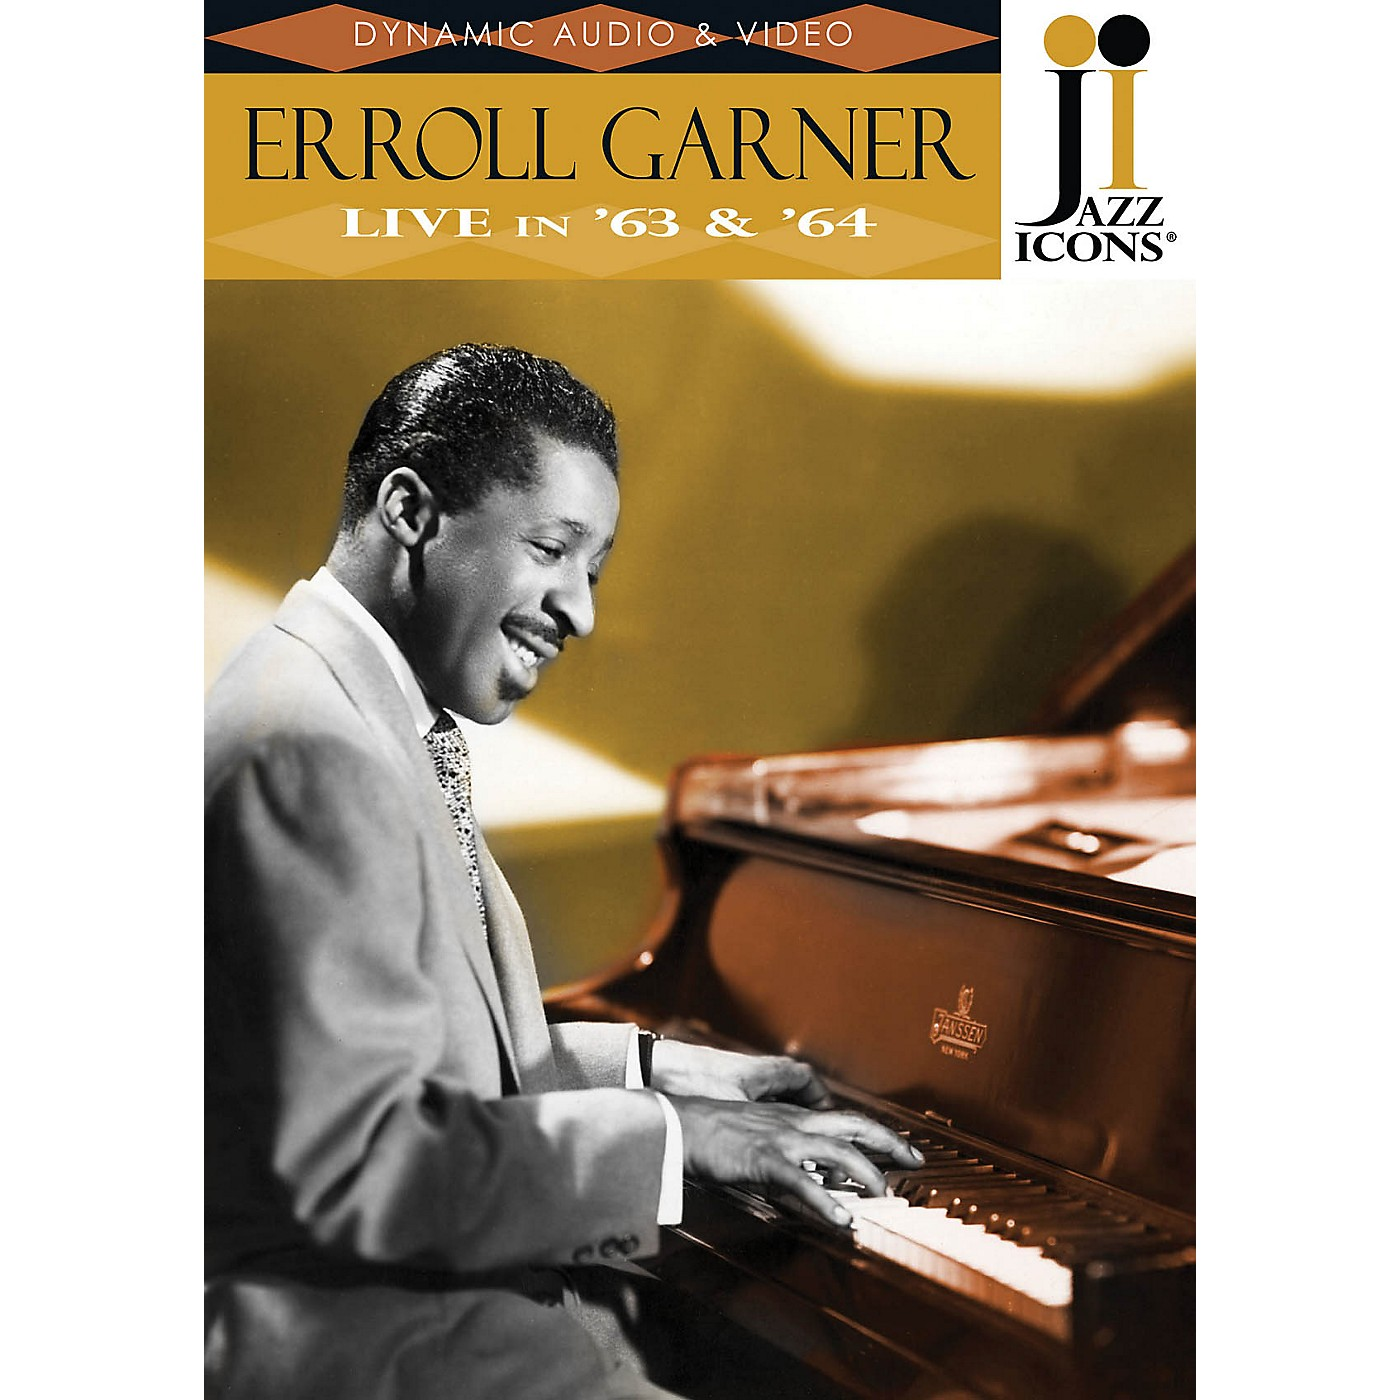 Jazz Icons Erroll Garner - Live in '63 & '64 (Jazz Icons DVD) DVD Series DVD Performed by Erroll Garner thumbnail